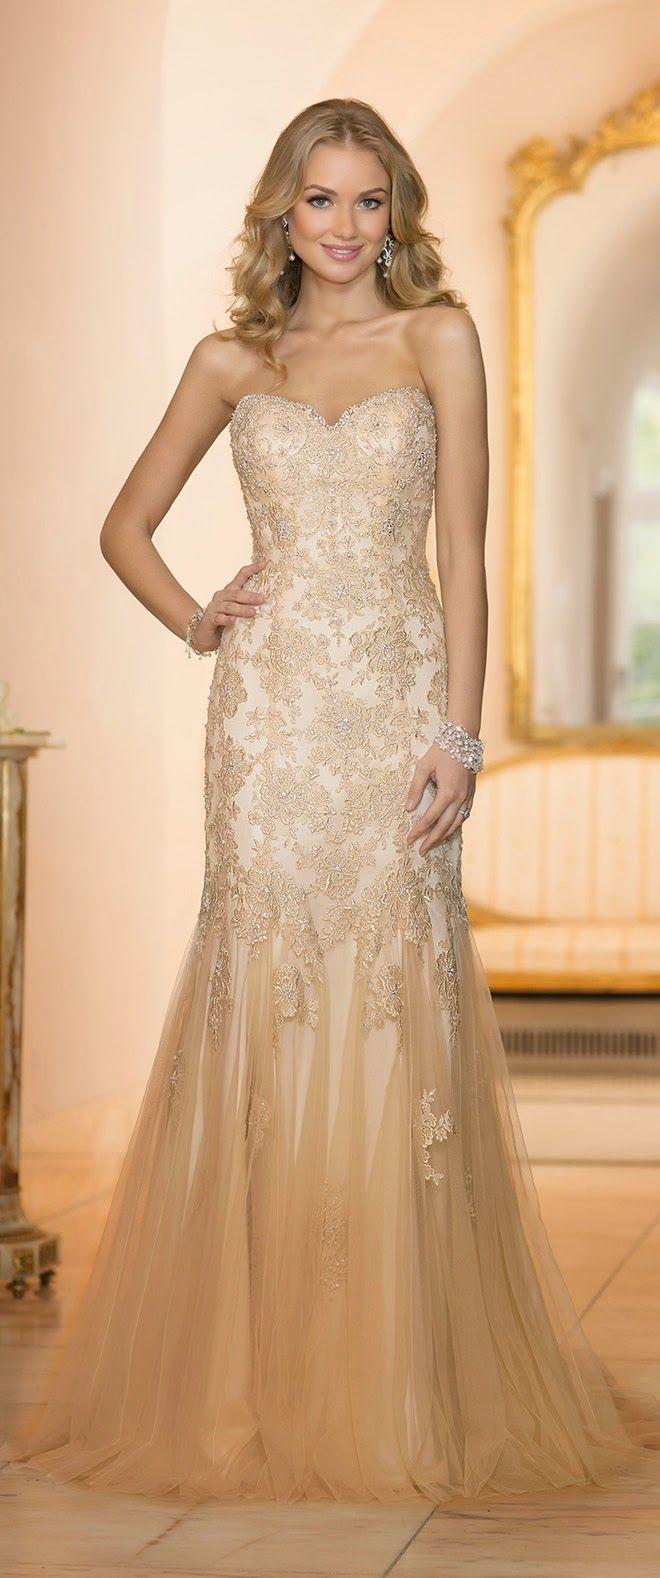 Ravishing wedding dresses designer best gown colour 2017 2018 ravishing wedding dresses designer best gown colour 2017 2018 ombrellifo Images